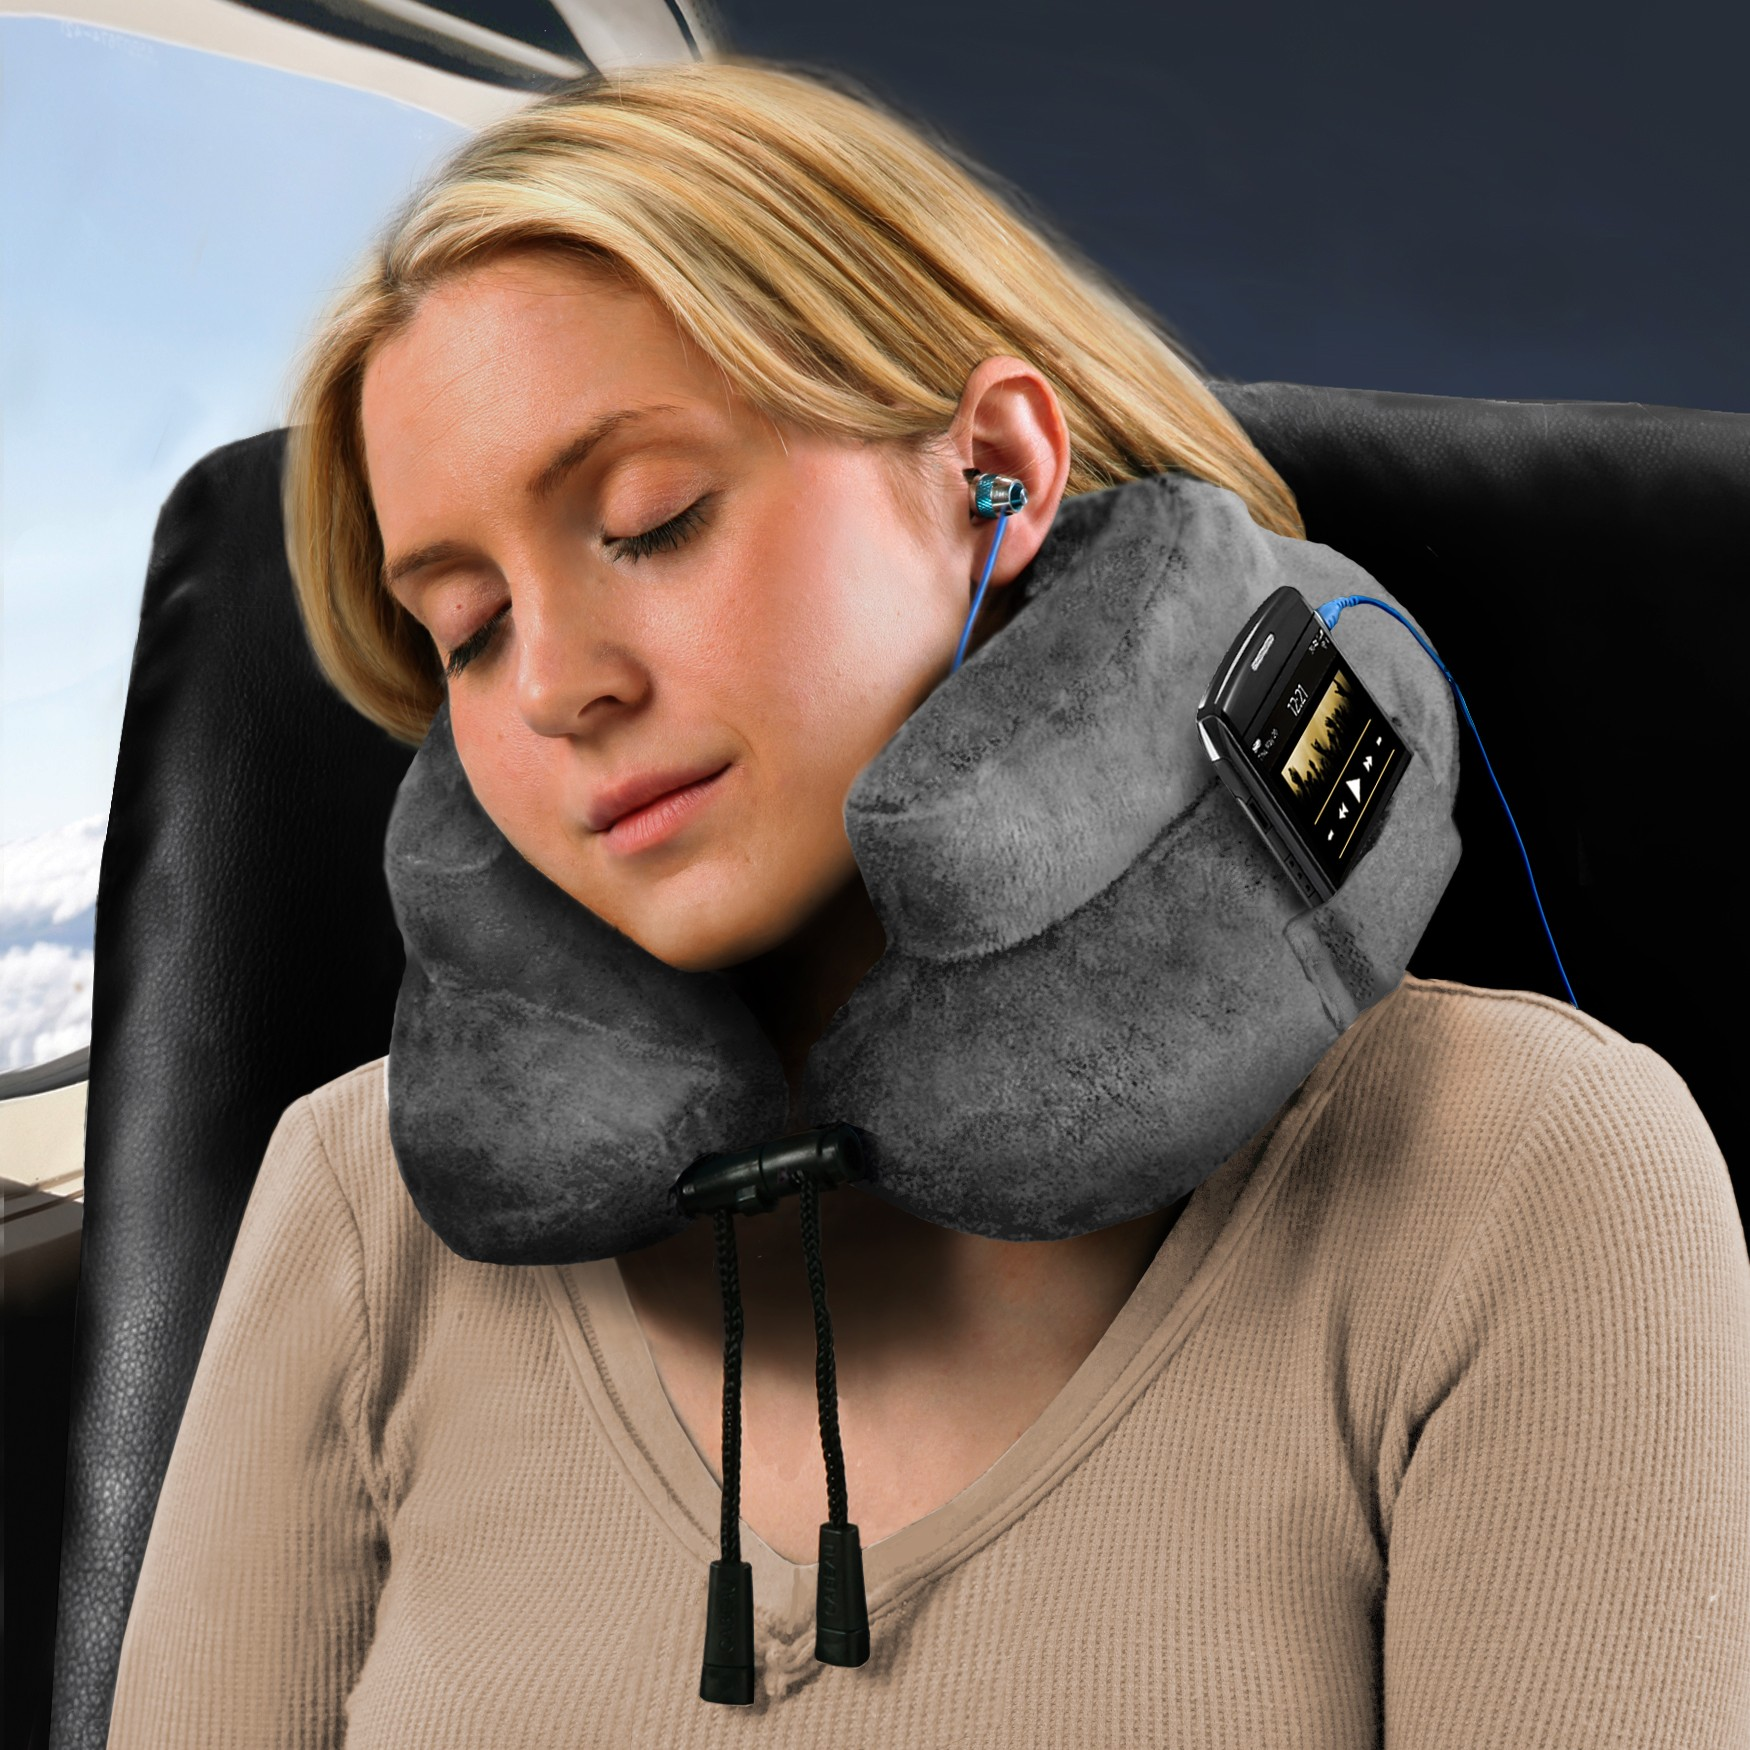 http://www.sleepsolutions.com.au/travel-pillows